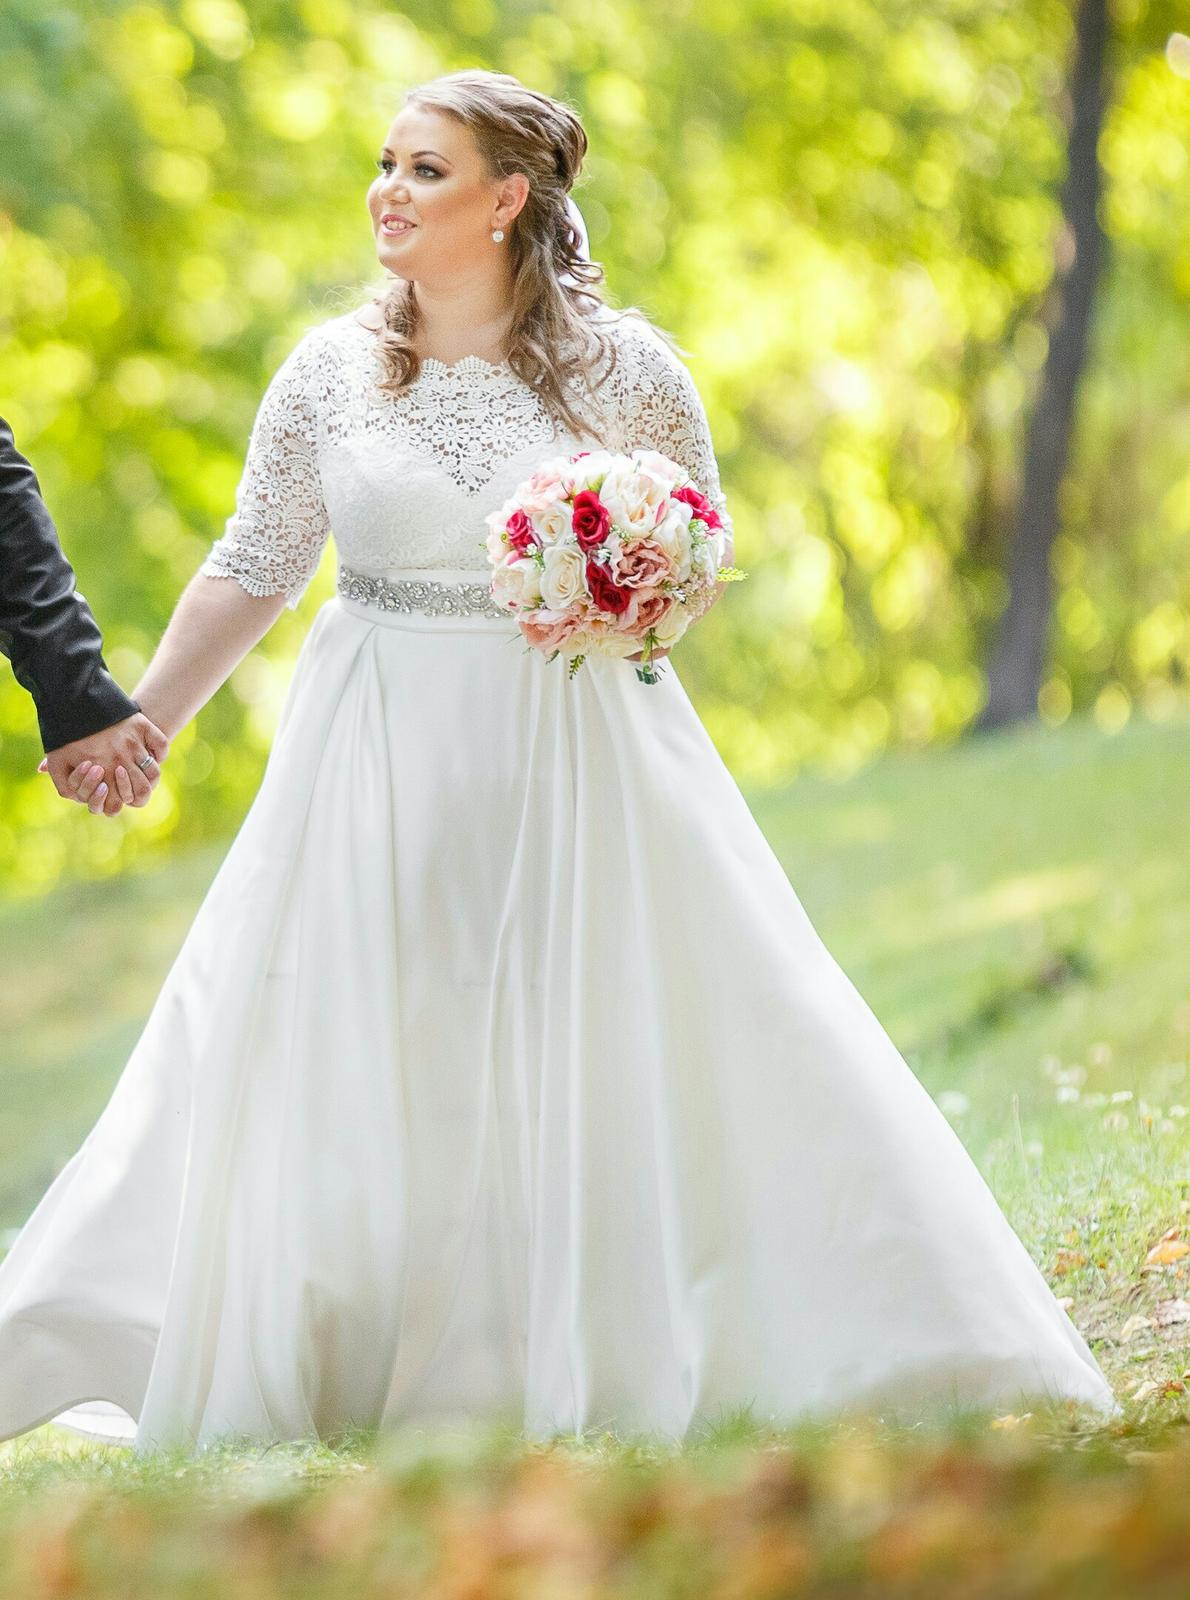 Svadobné šaty pre nízku nevesticku - Obrázok č. 2